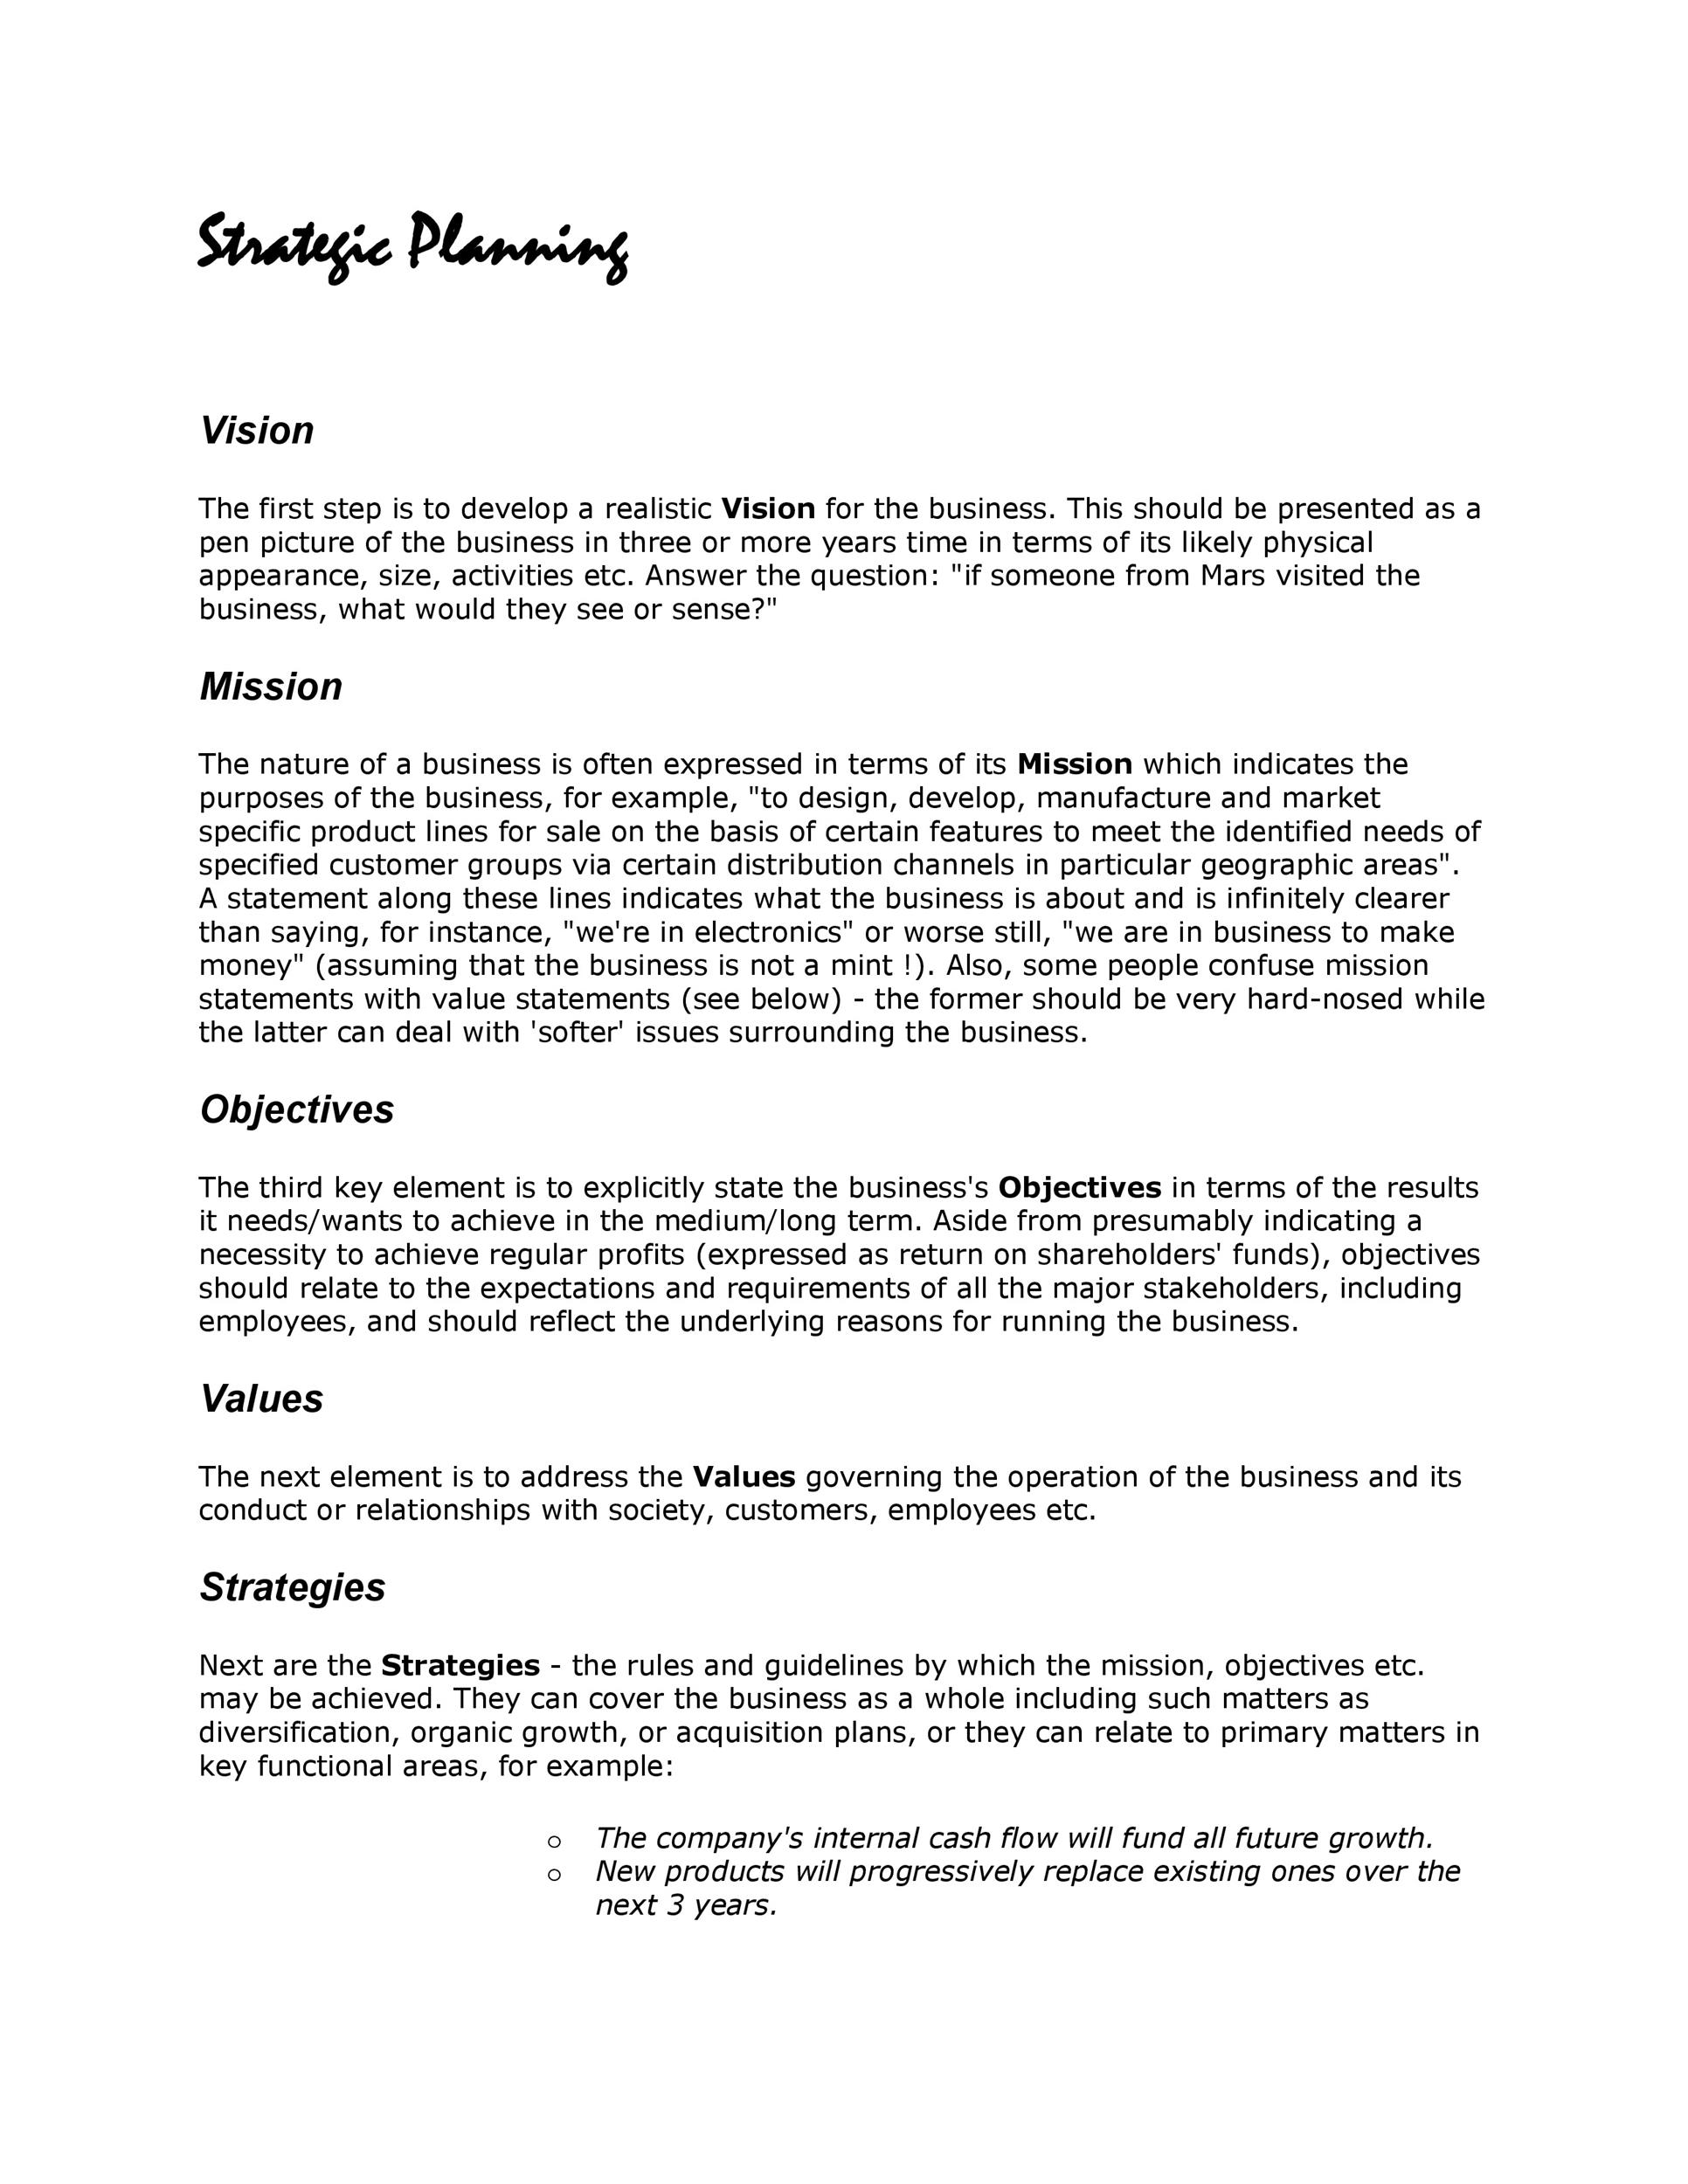 Strategic Plan Template Doc from templatelab.com